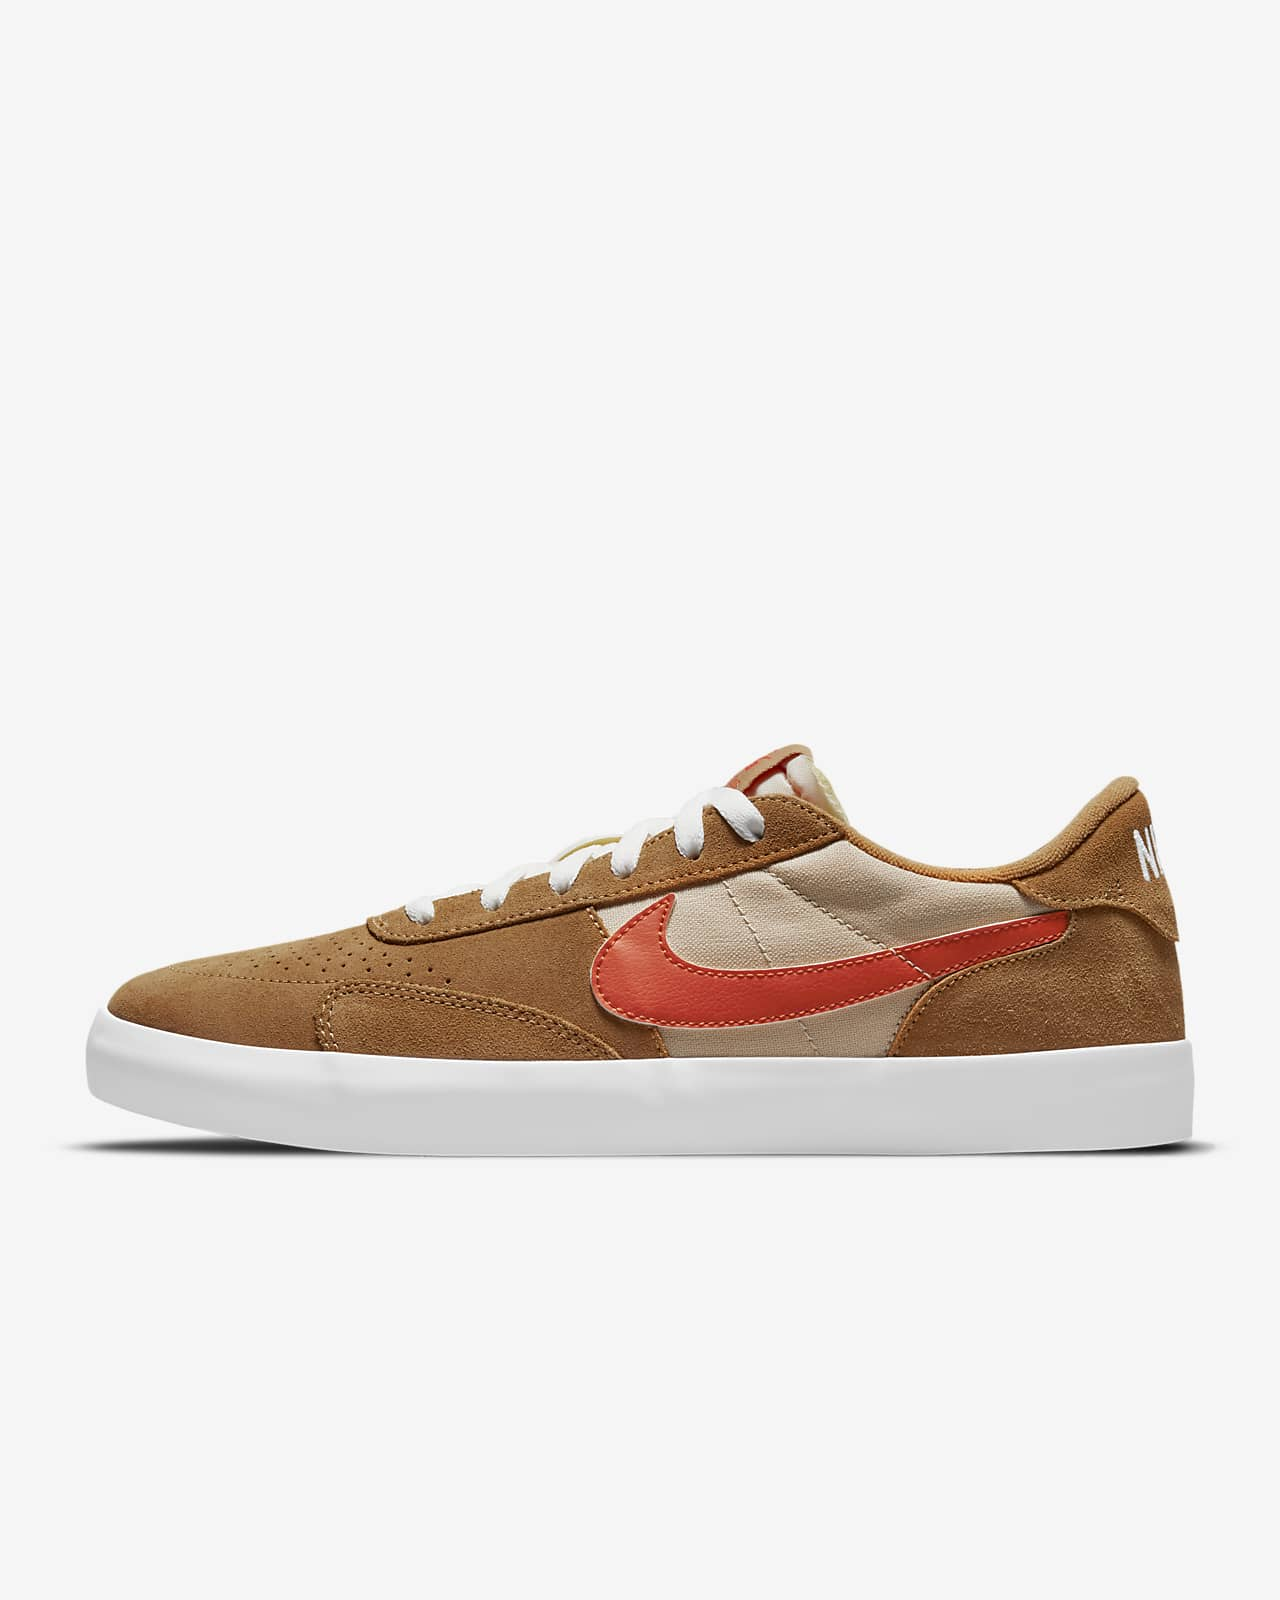 Nike SB Heritage Vulc Kaykay Ayakkabısı